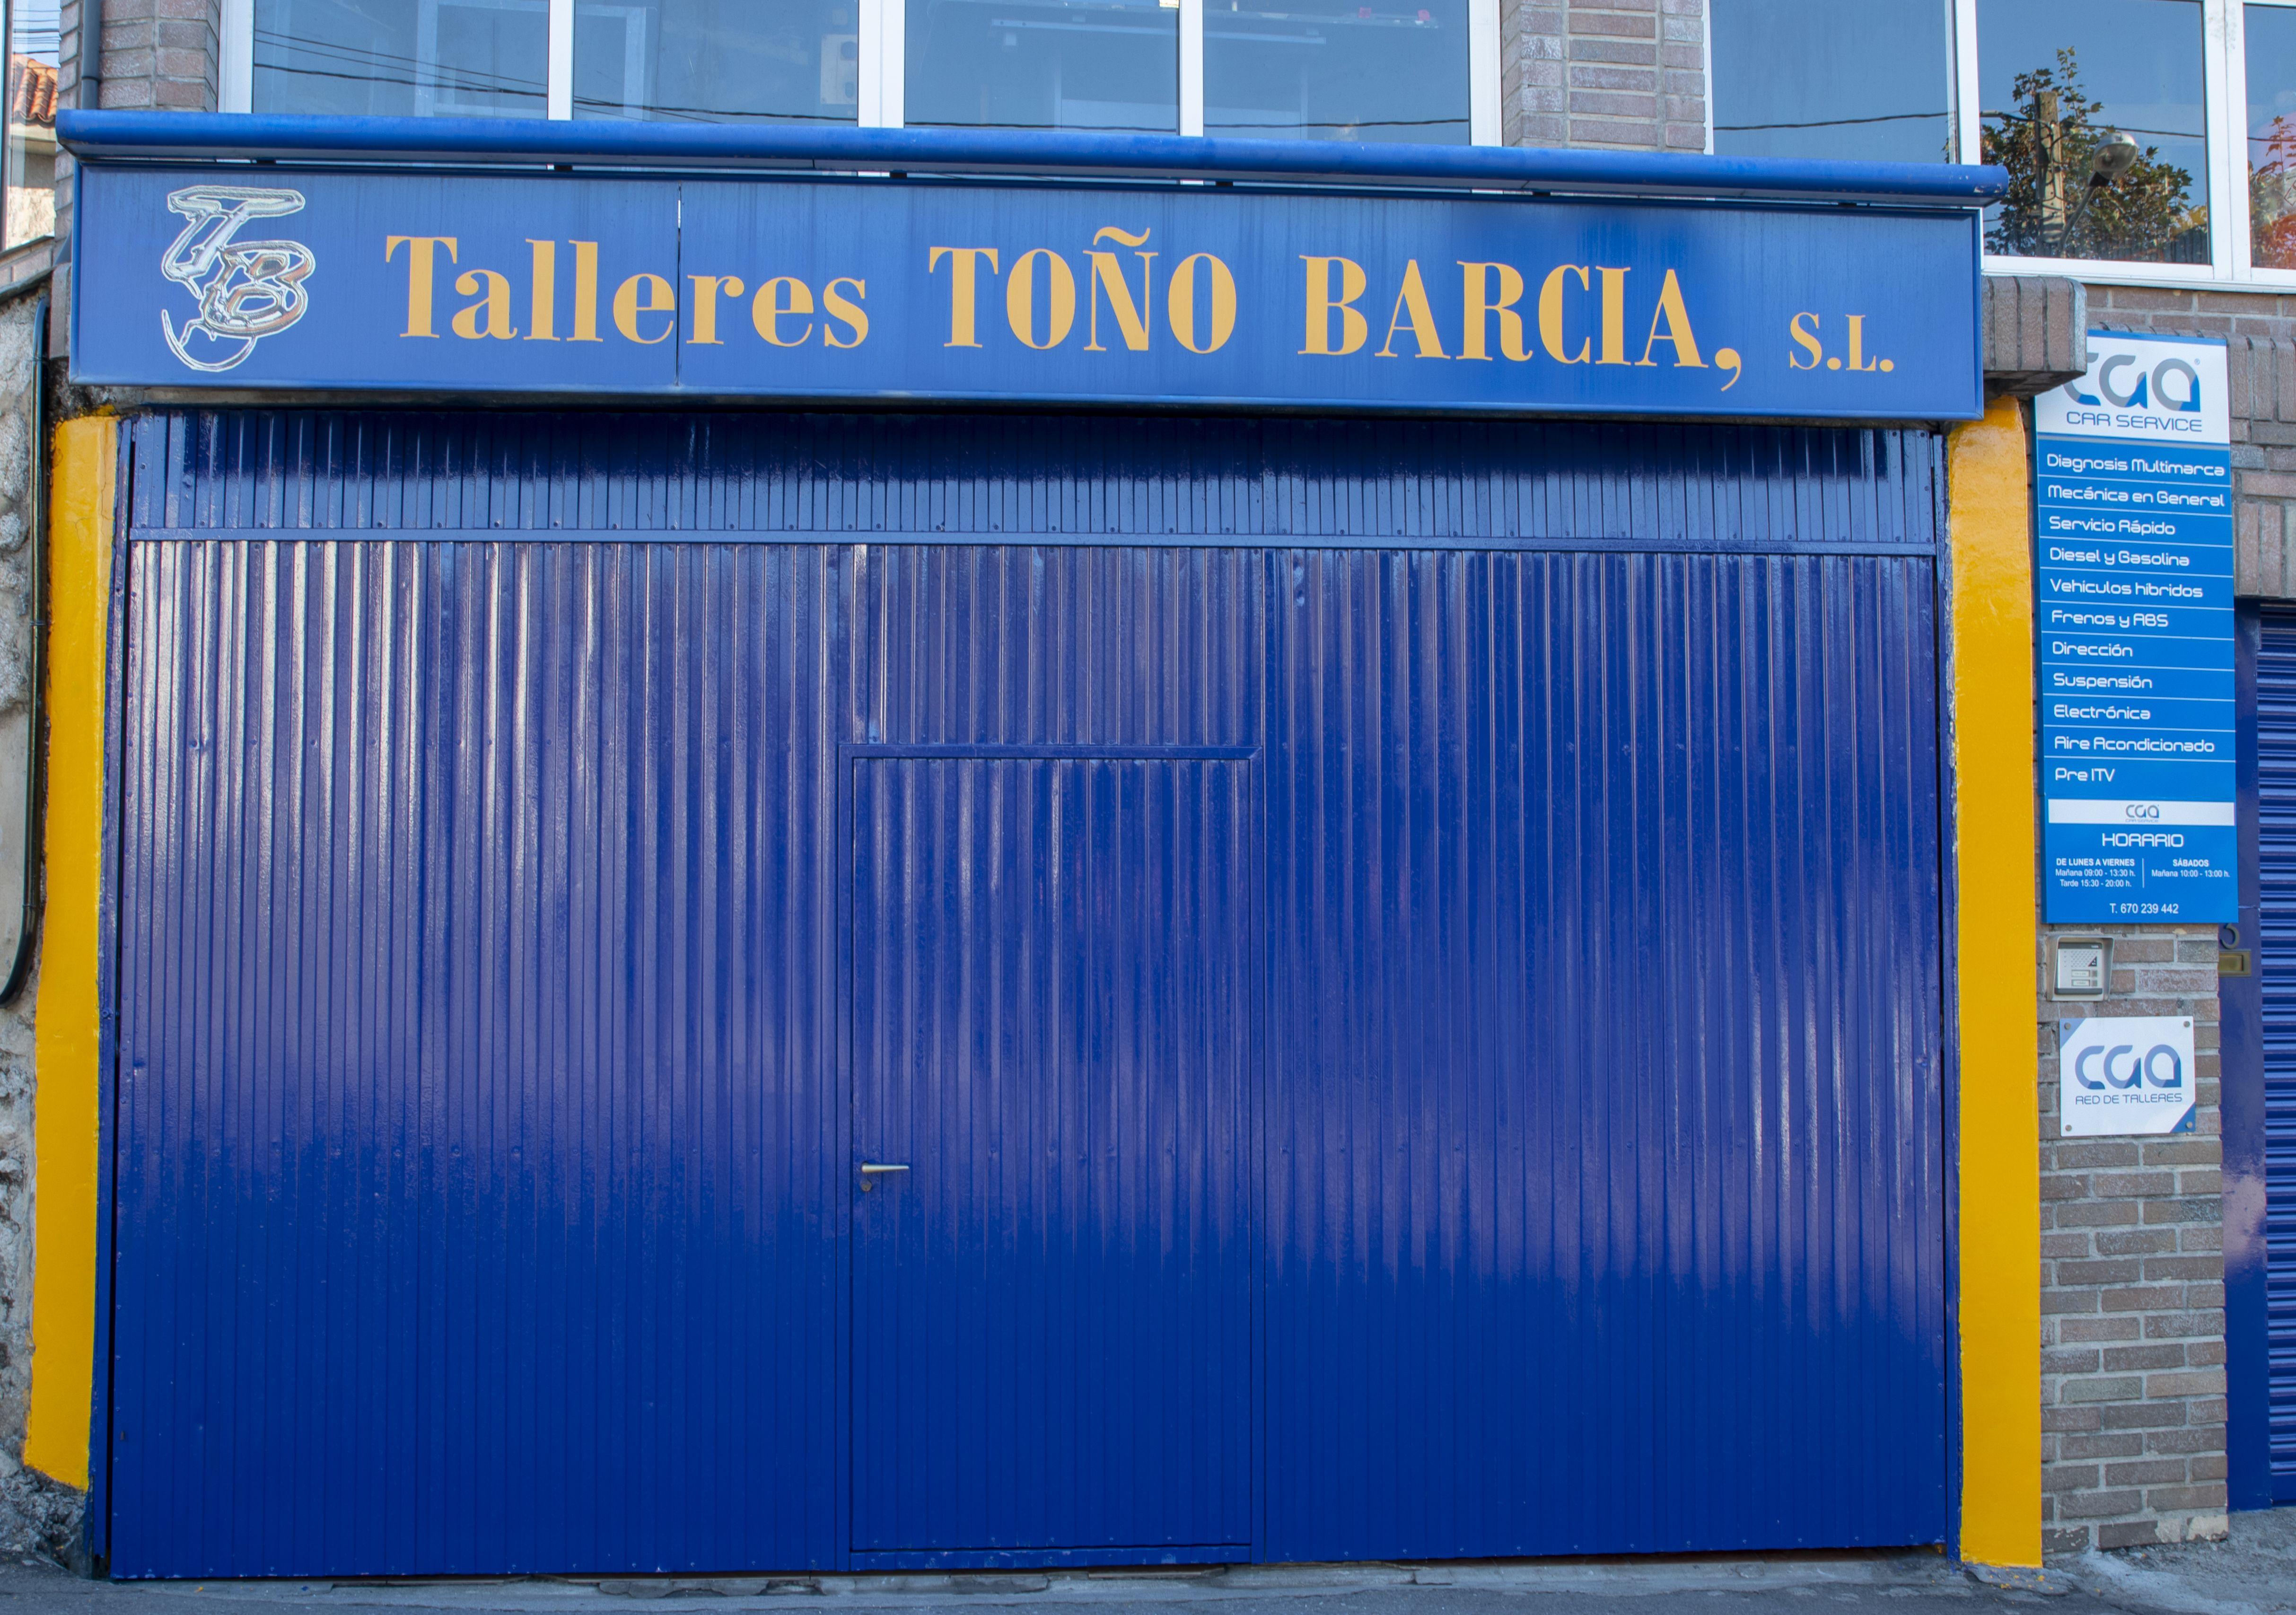 Garaje Talleres Toño Barcia